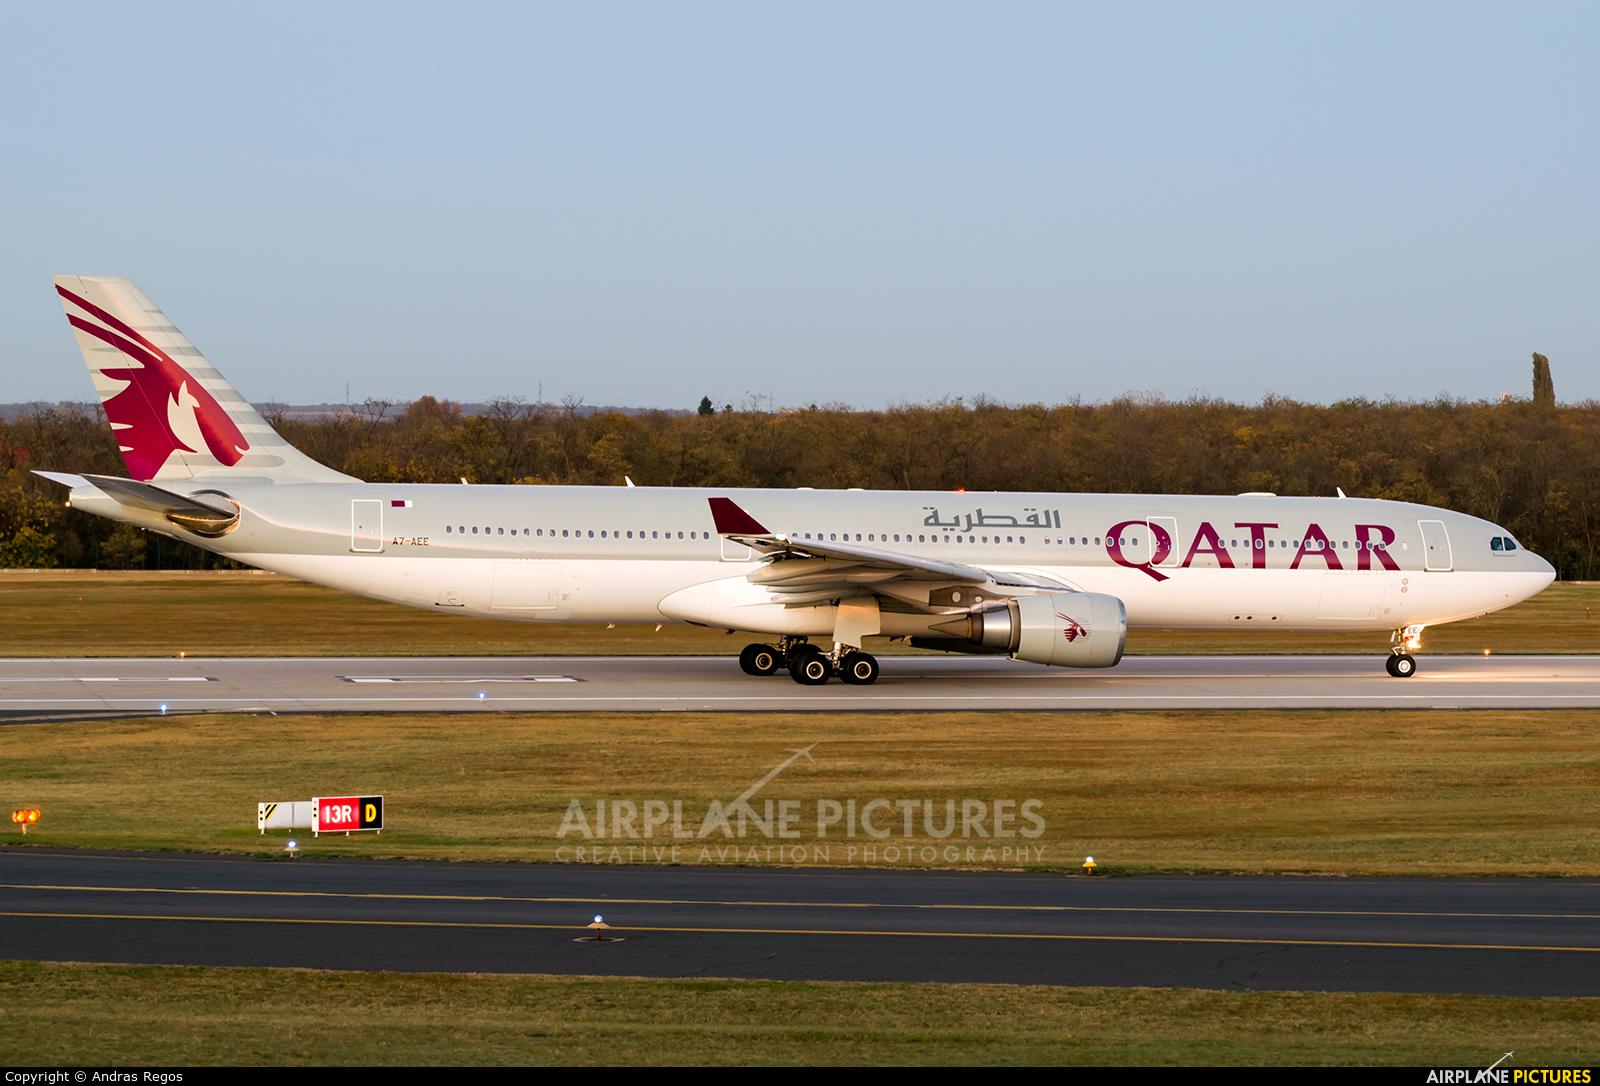 Qatar Airways A7-AEE aircraft at Budapest Ferenc Liszt International Airport